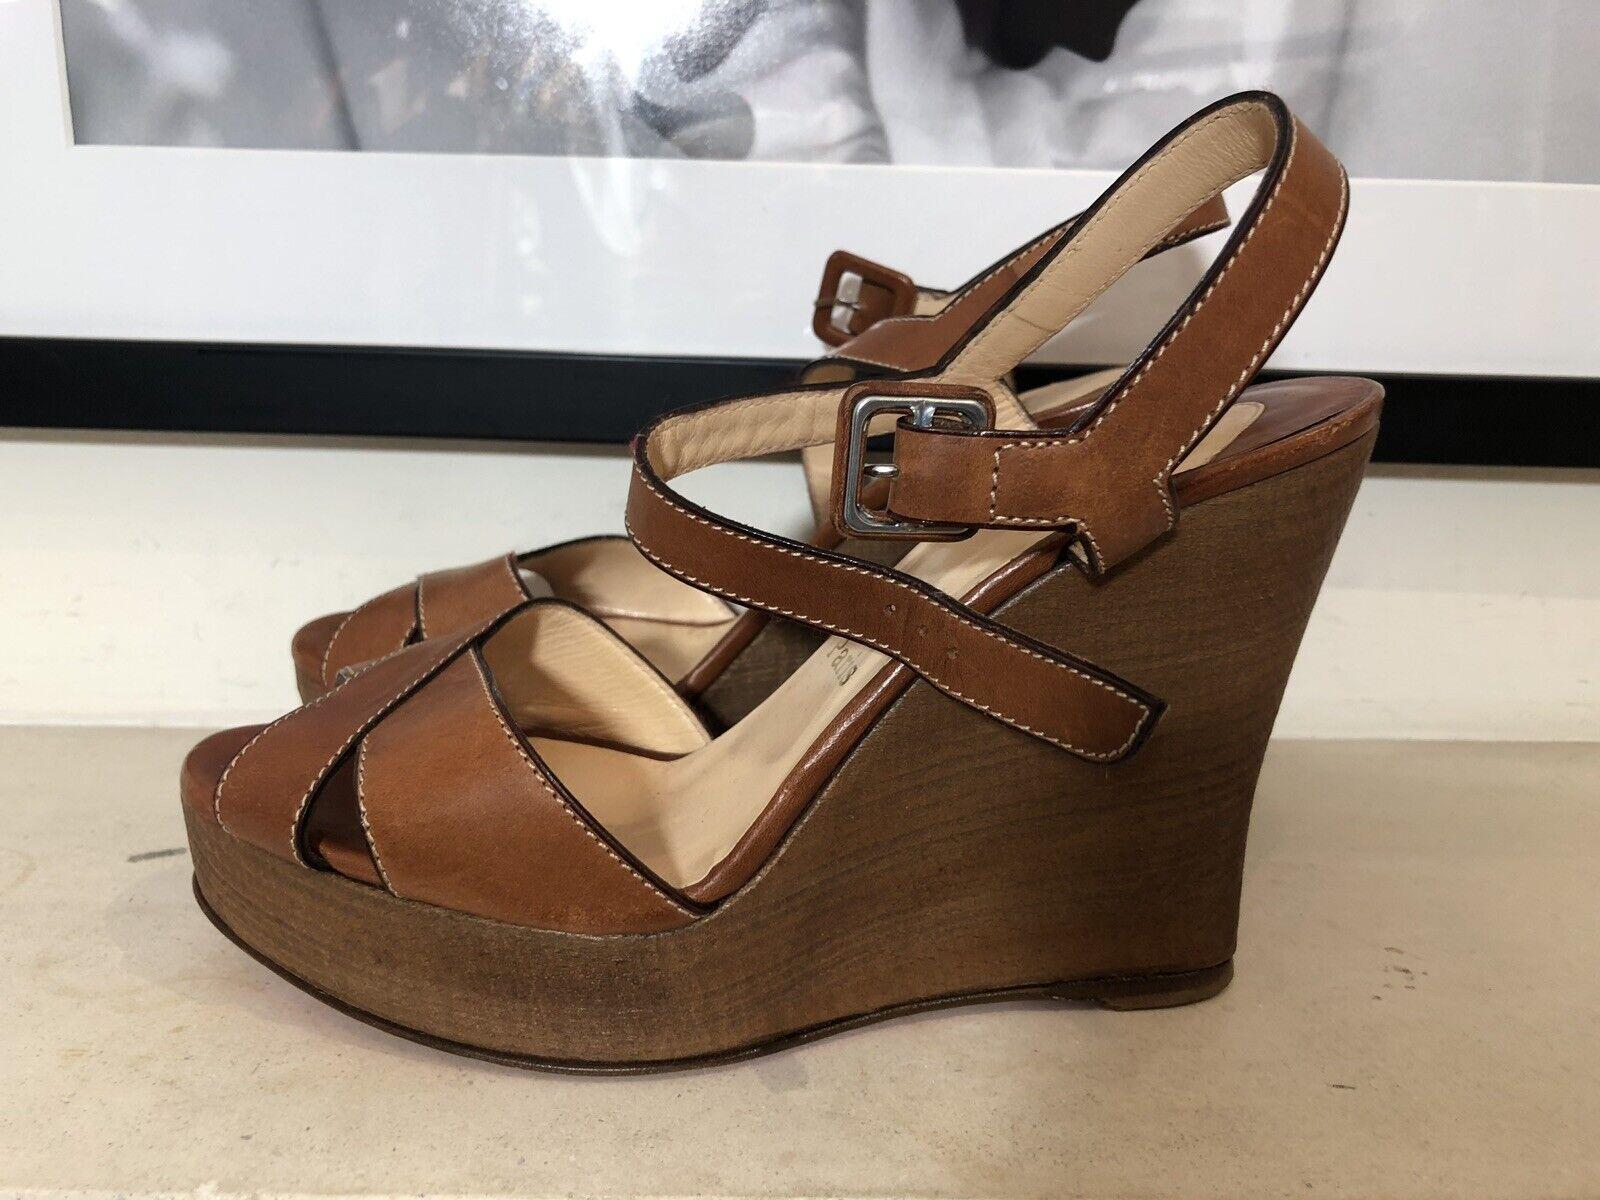 Louboutin braun Leather Wedge Sandals UK6